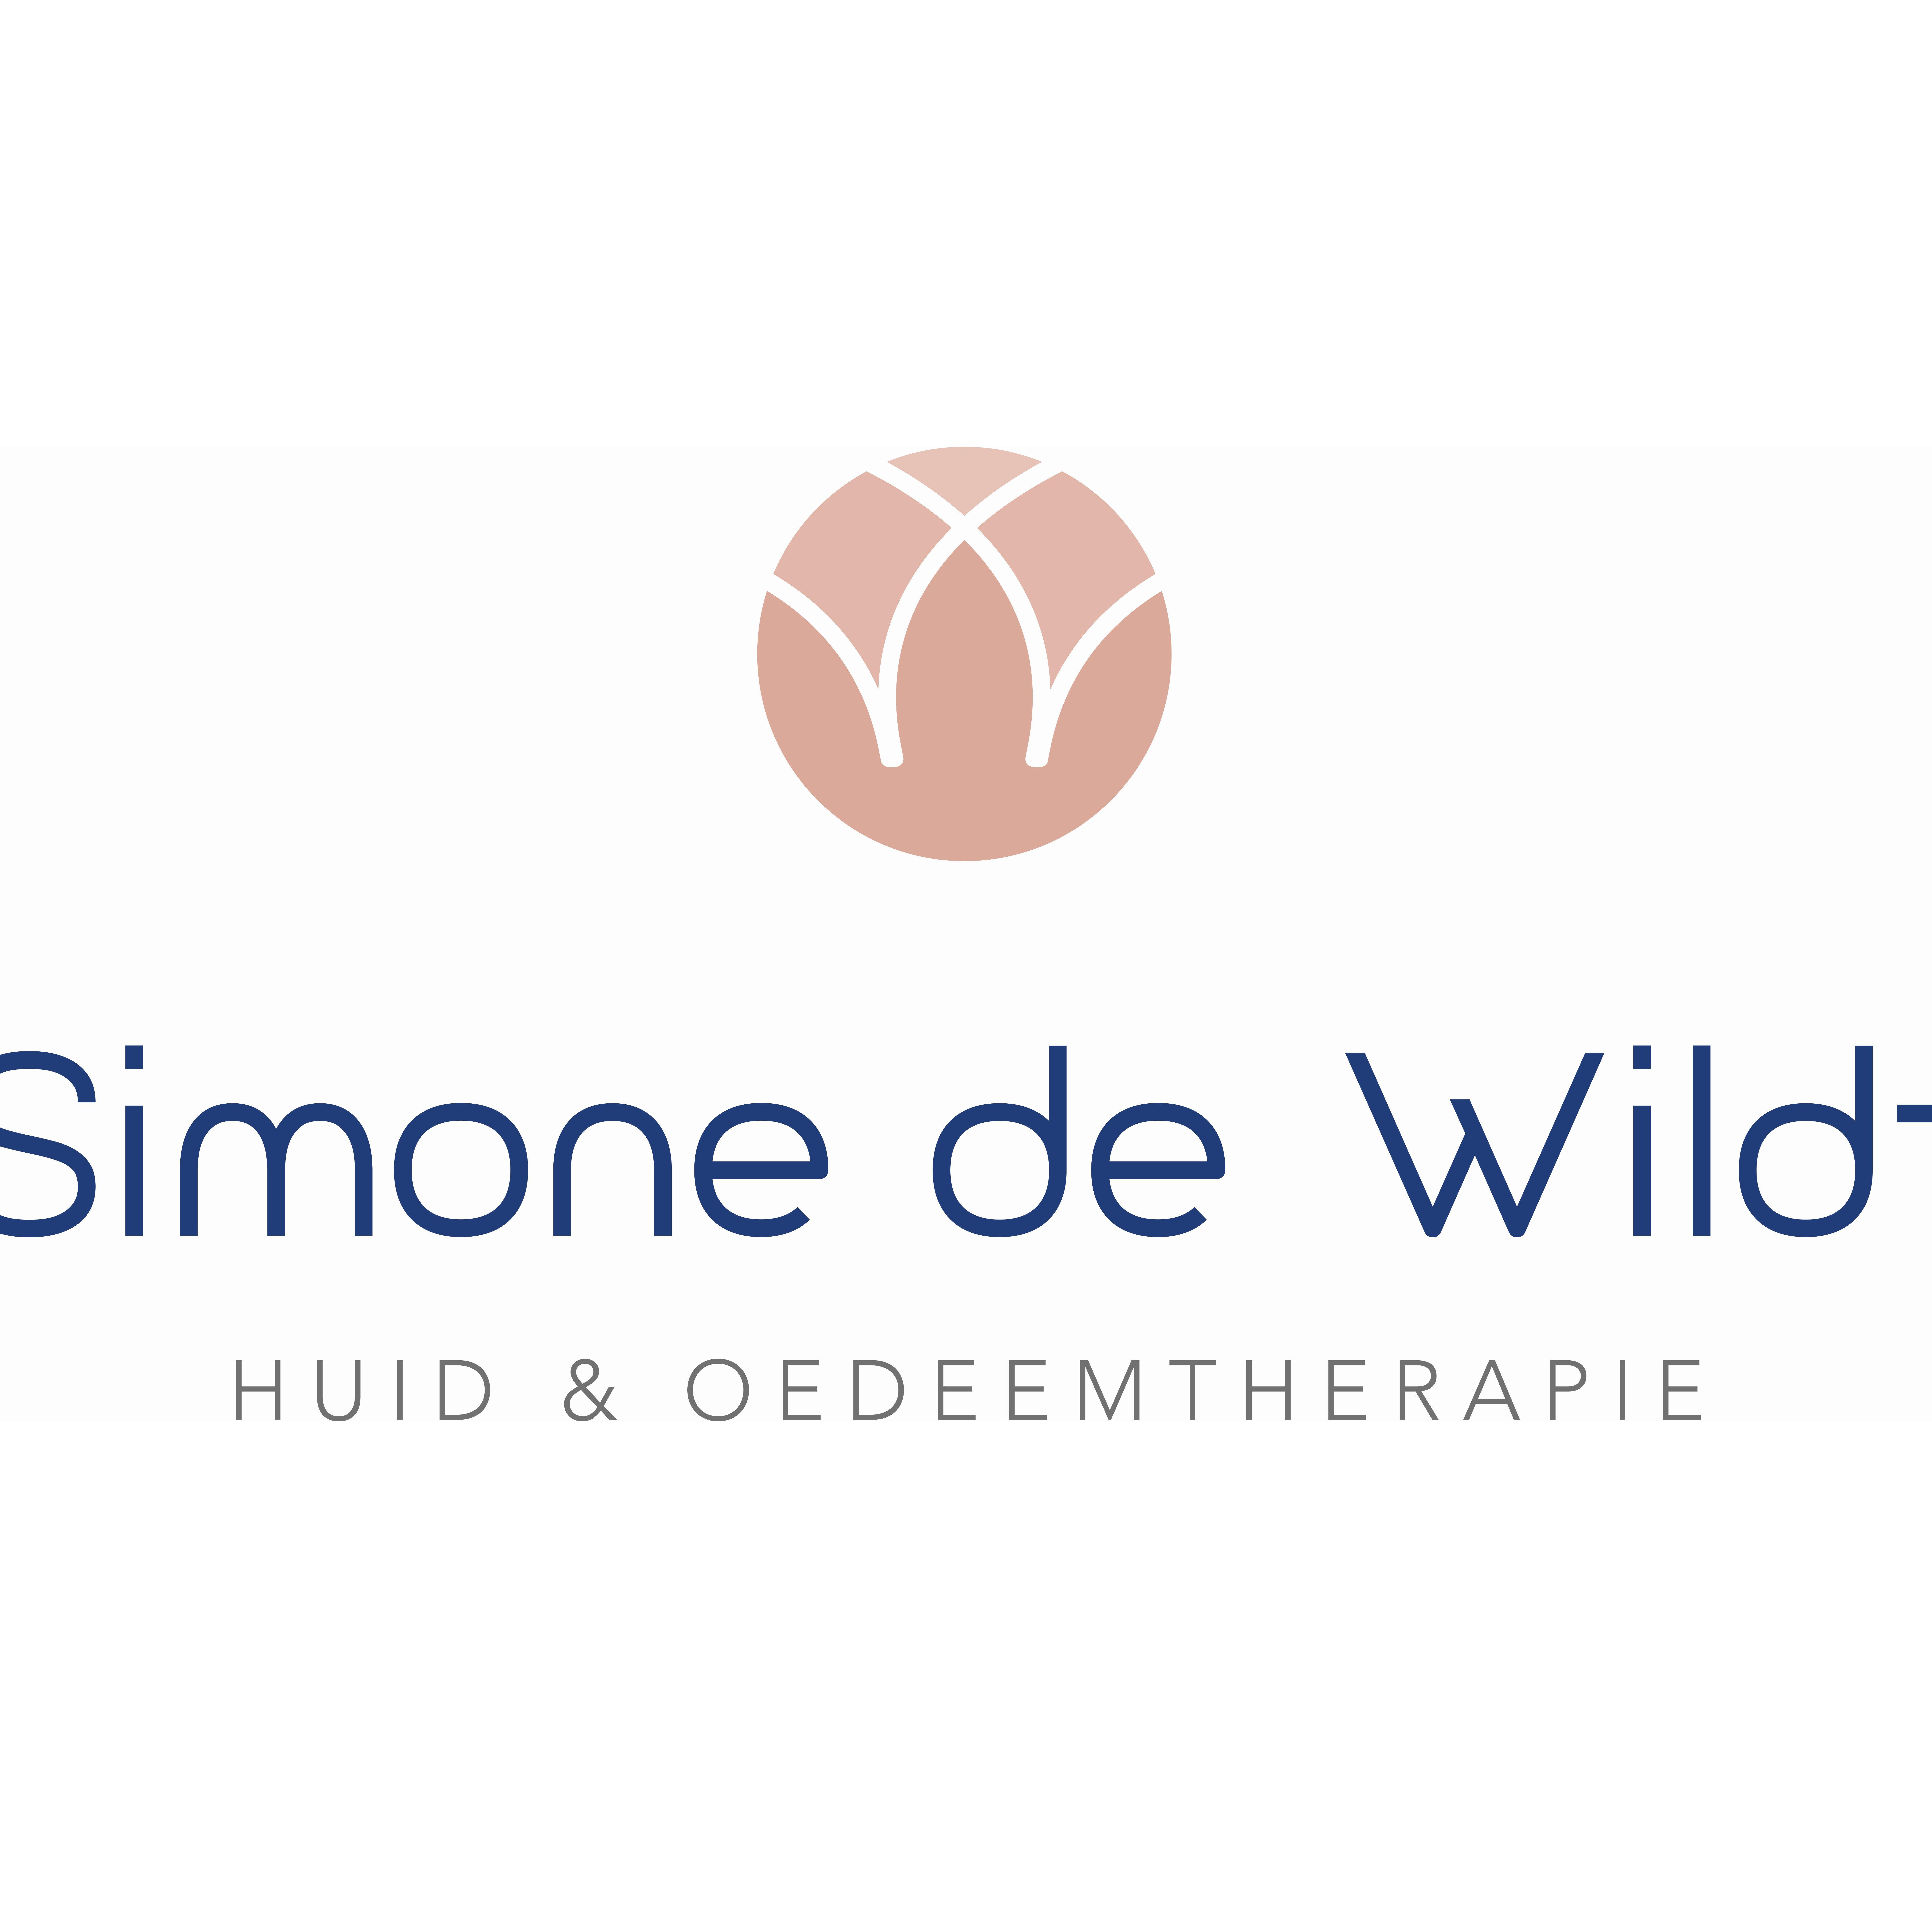 Simone de Wildt | Huid- & Oedeemtherapie Gennep